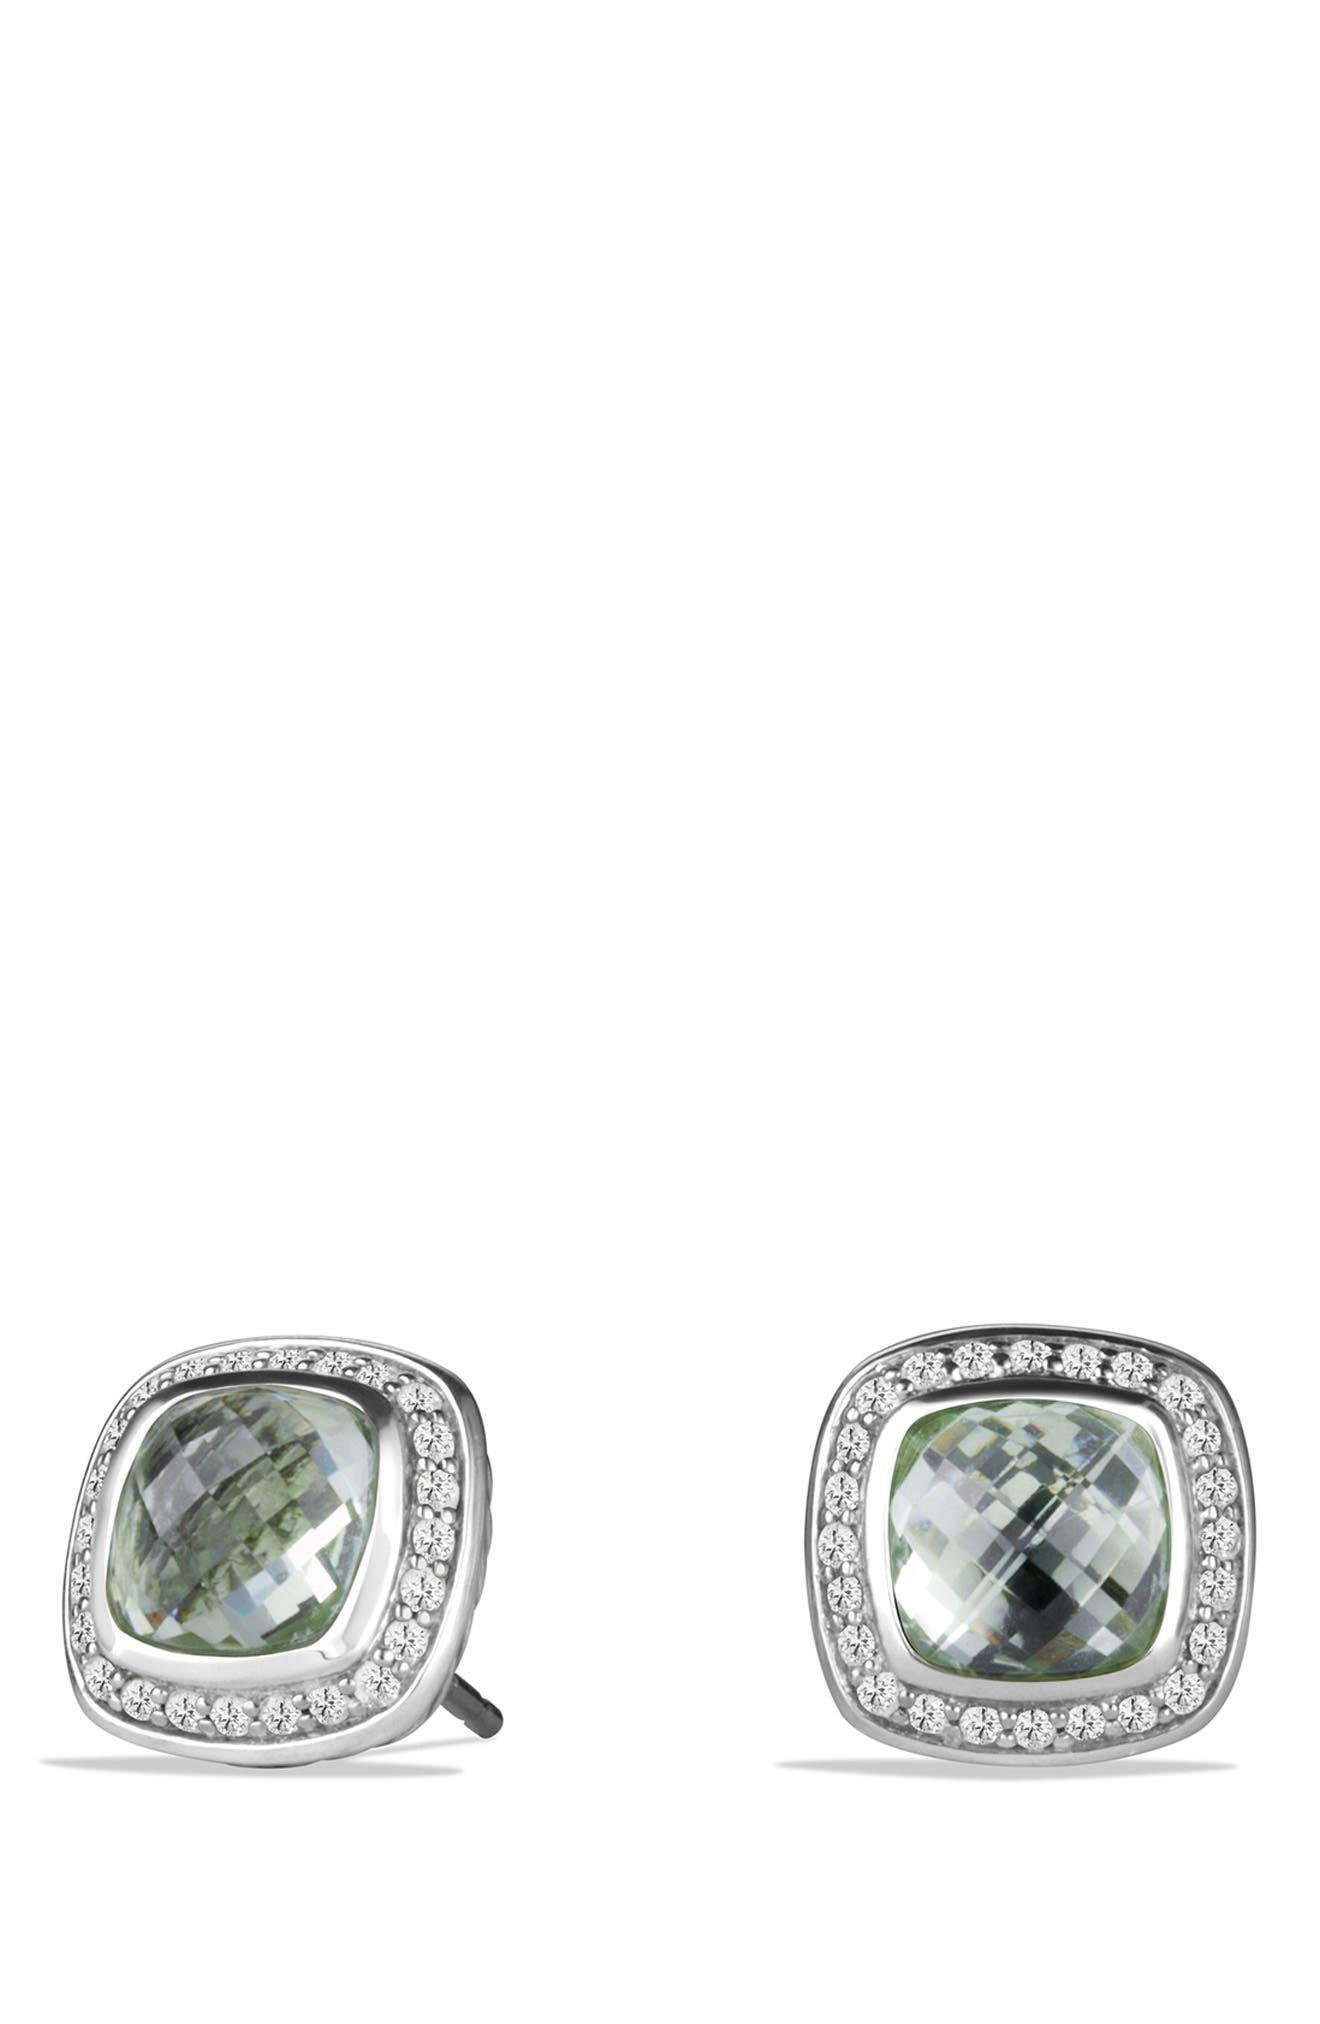 DAVID YURMAN 'Albion' Earrings with Semiprecious Stone and Diamonds, Main, color, PRASIOLITE